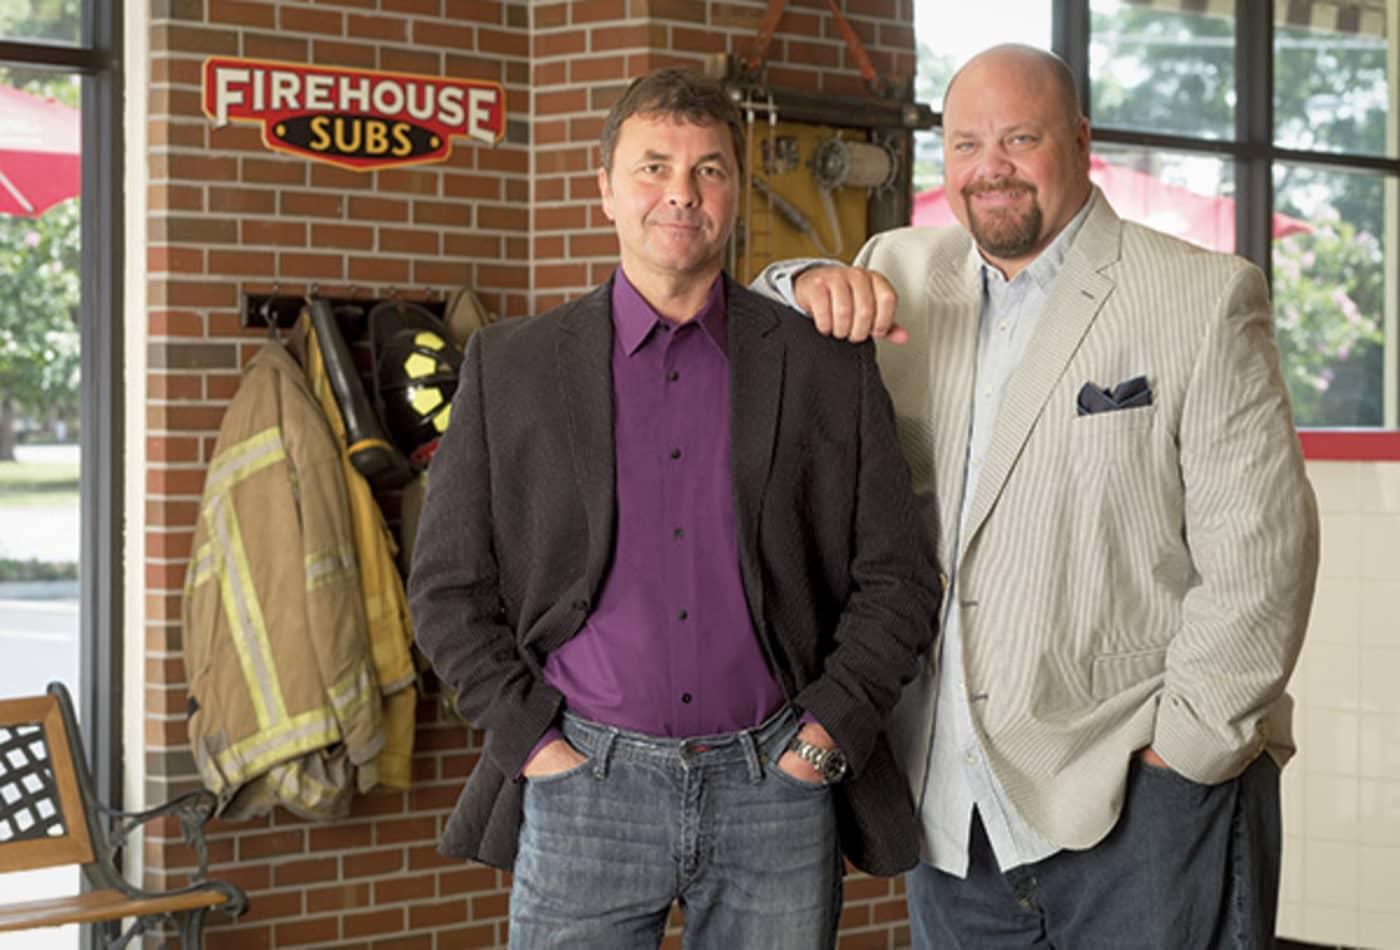 100-million-dollar-ideas-firehouse-subs.jpg